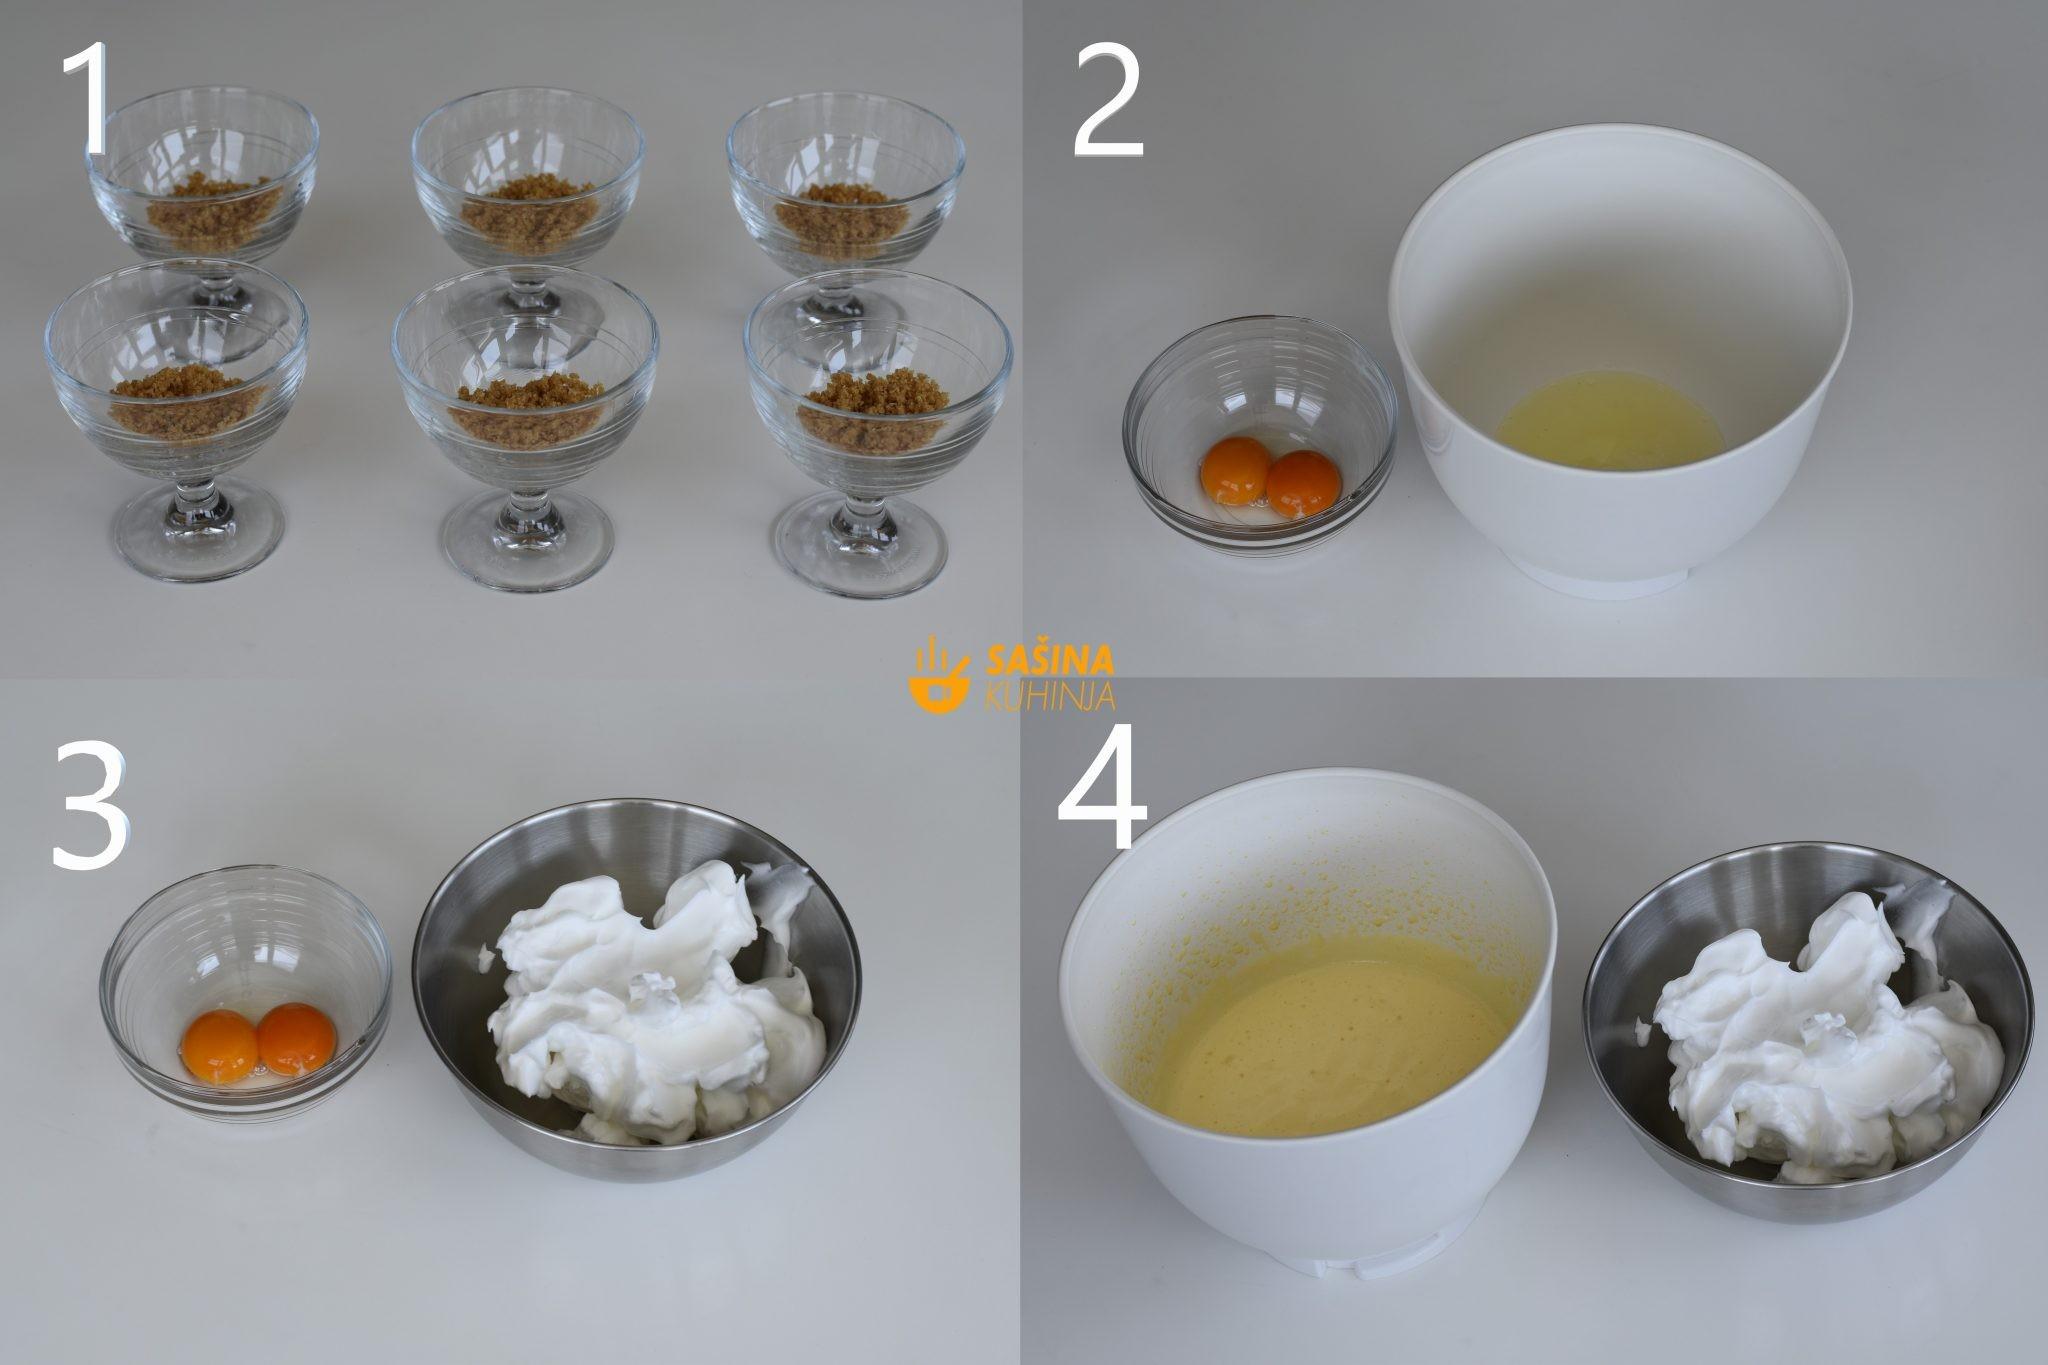 kremšnite iz čaše krempita brzi recept bez pečenja